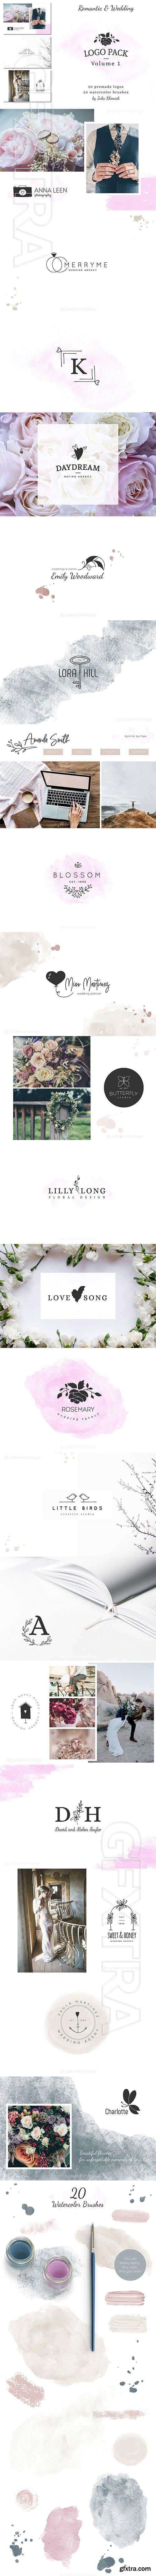 CreativeMarket - Logo Pack Vol1 Romantic & Wedding 2691229